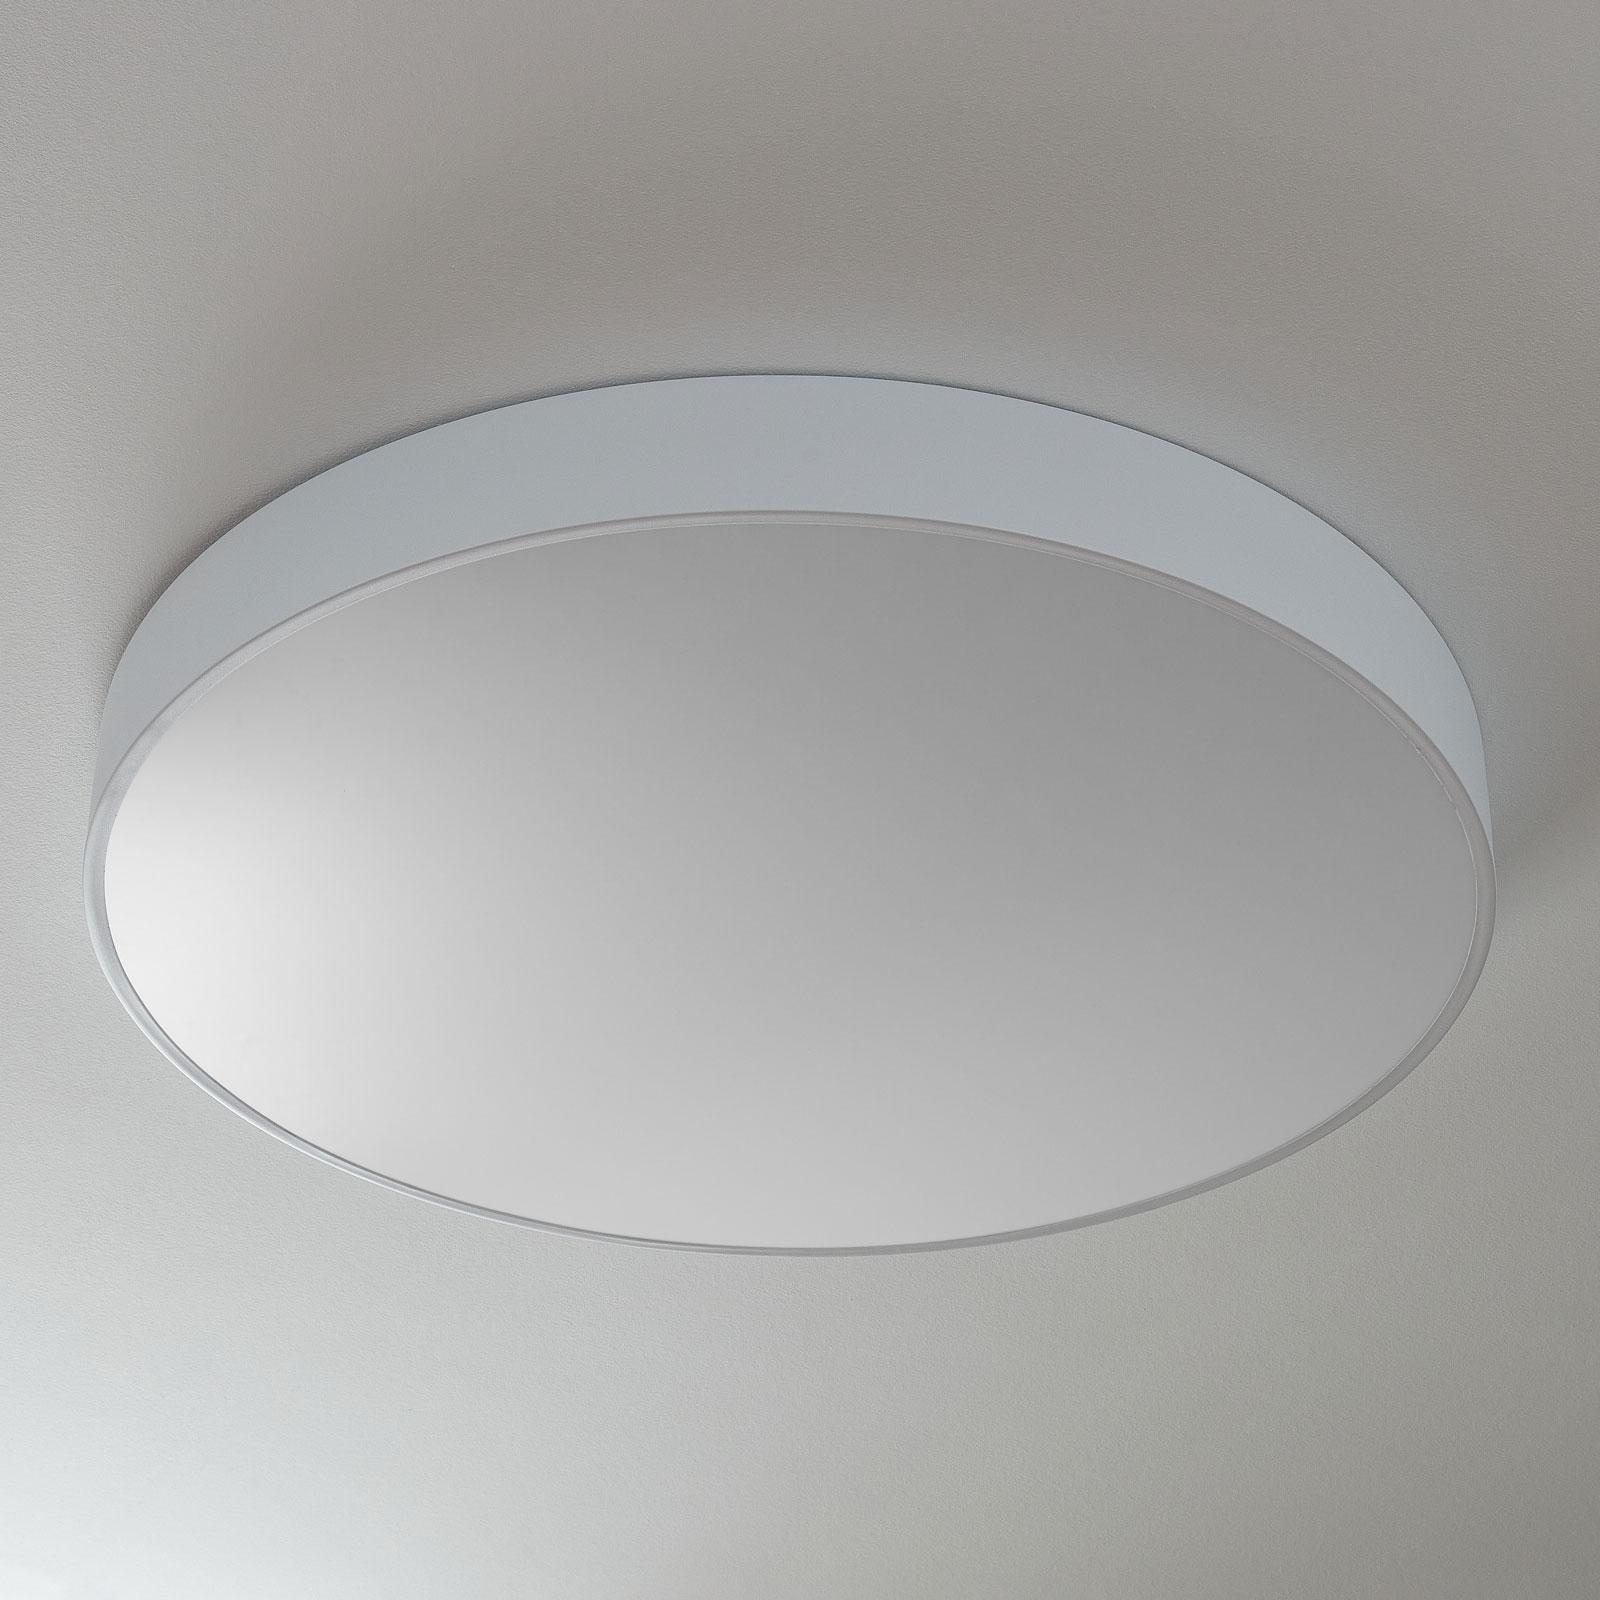 Isia - ściemniana lampa sufitowa LED, Ø 100 cm